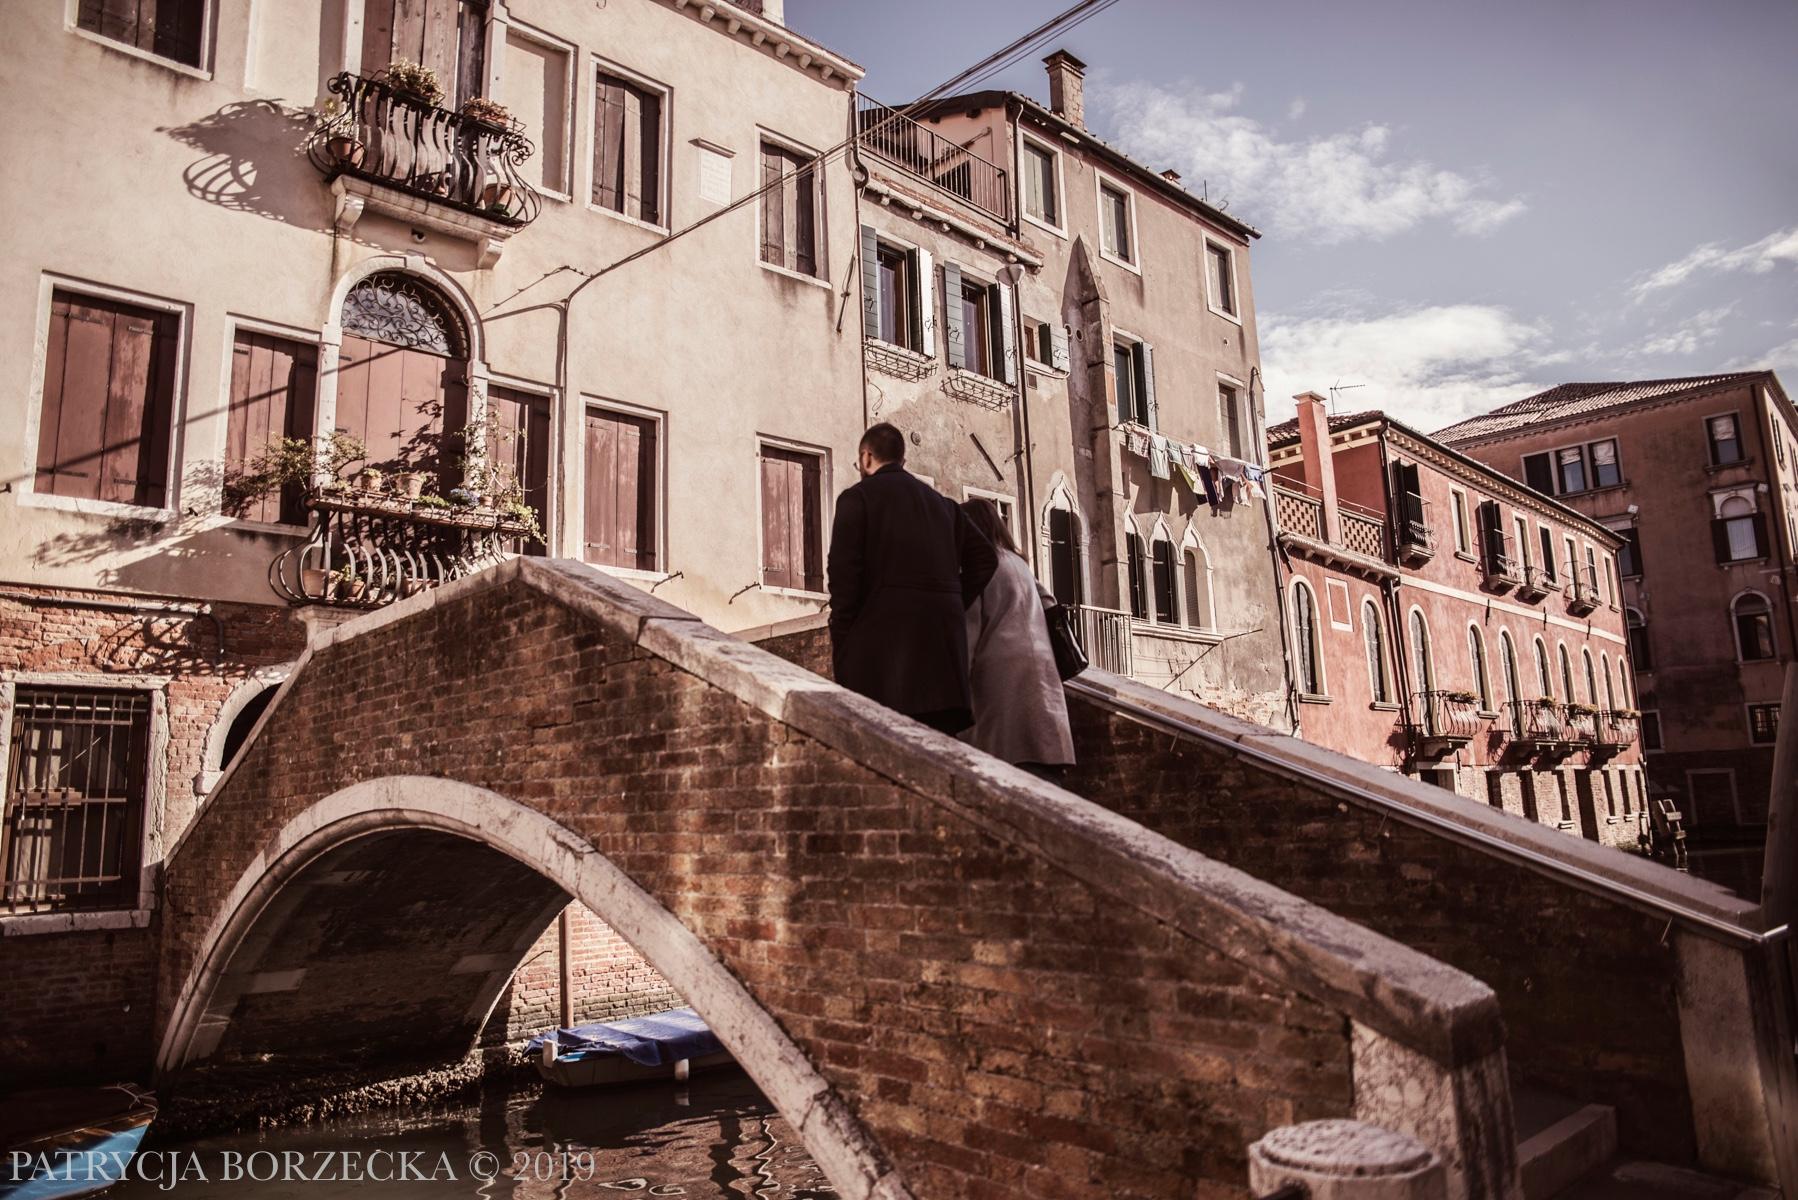 PatrycjaBorzecka-Photo-Venice-02